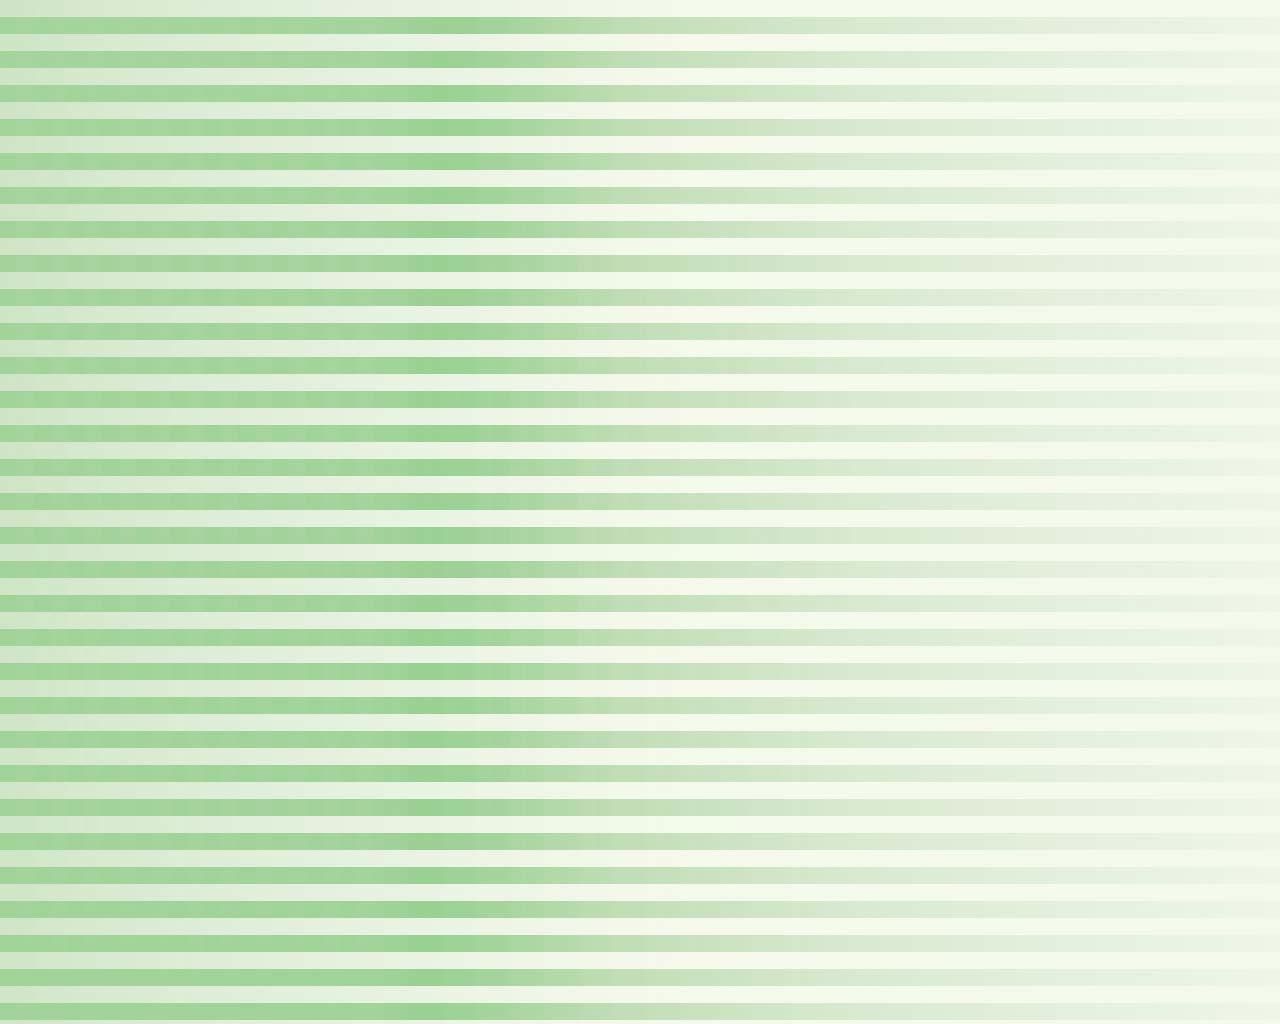 Stripe Pattern Wallpaper Pastel Colour Part 1